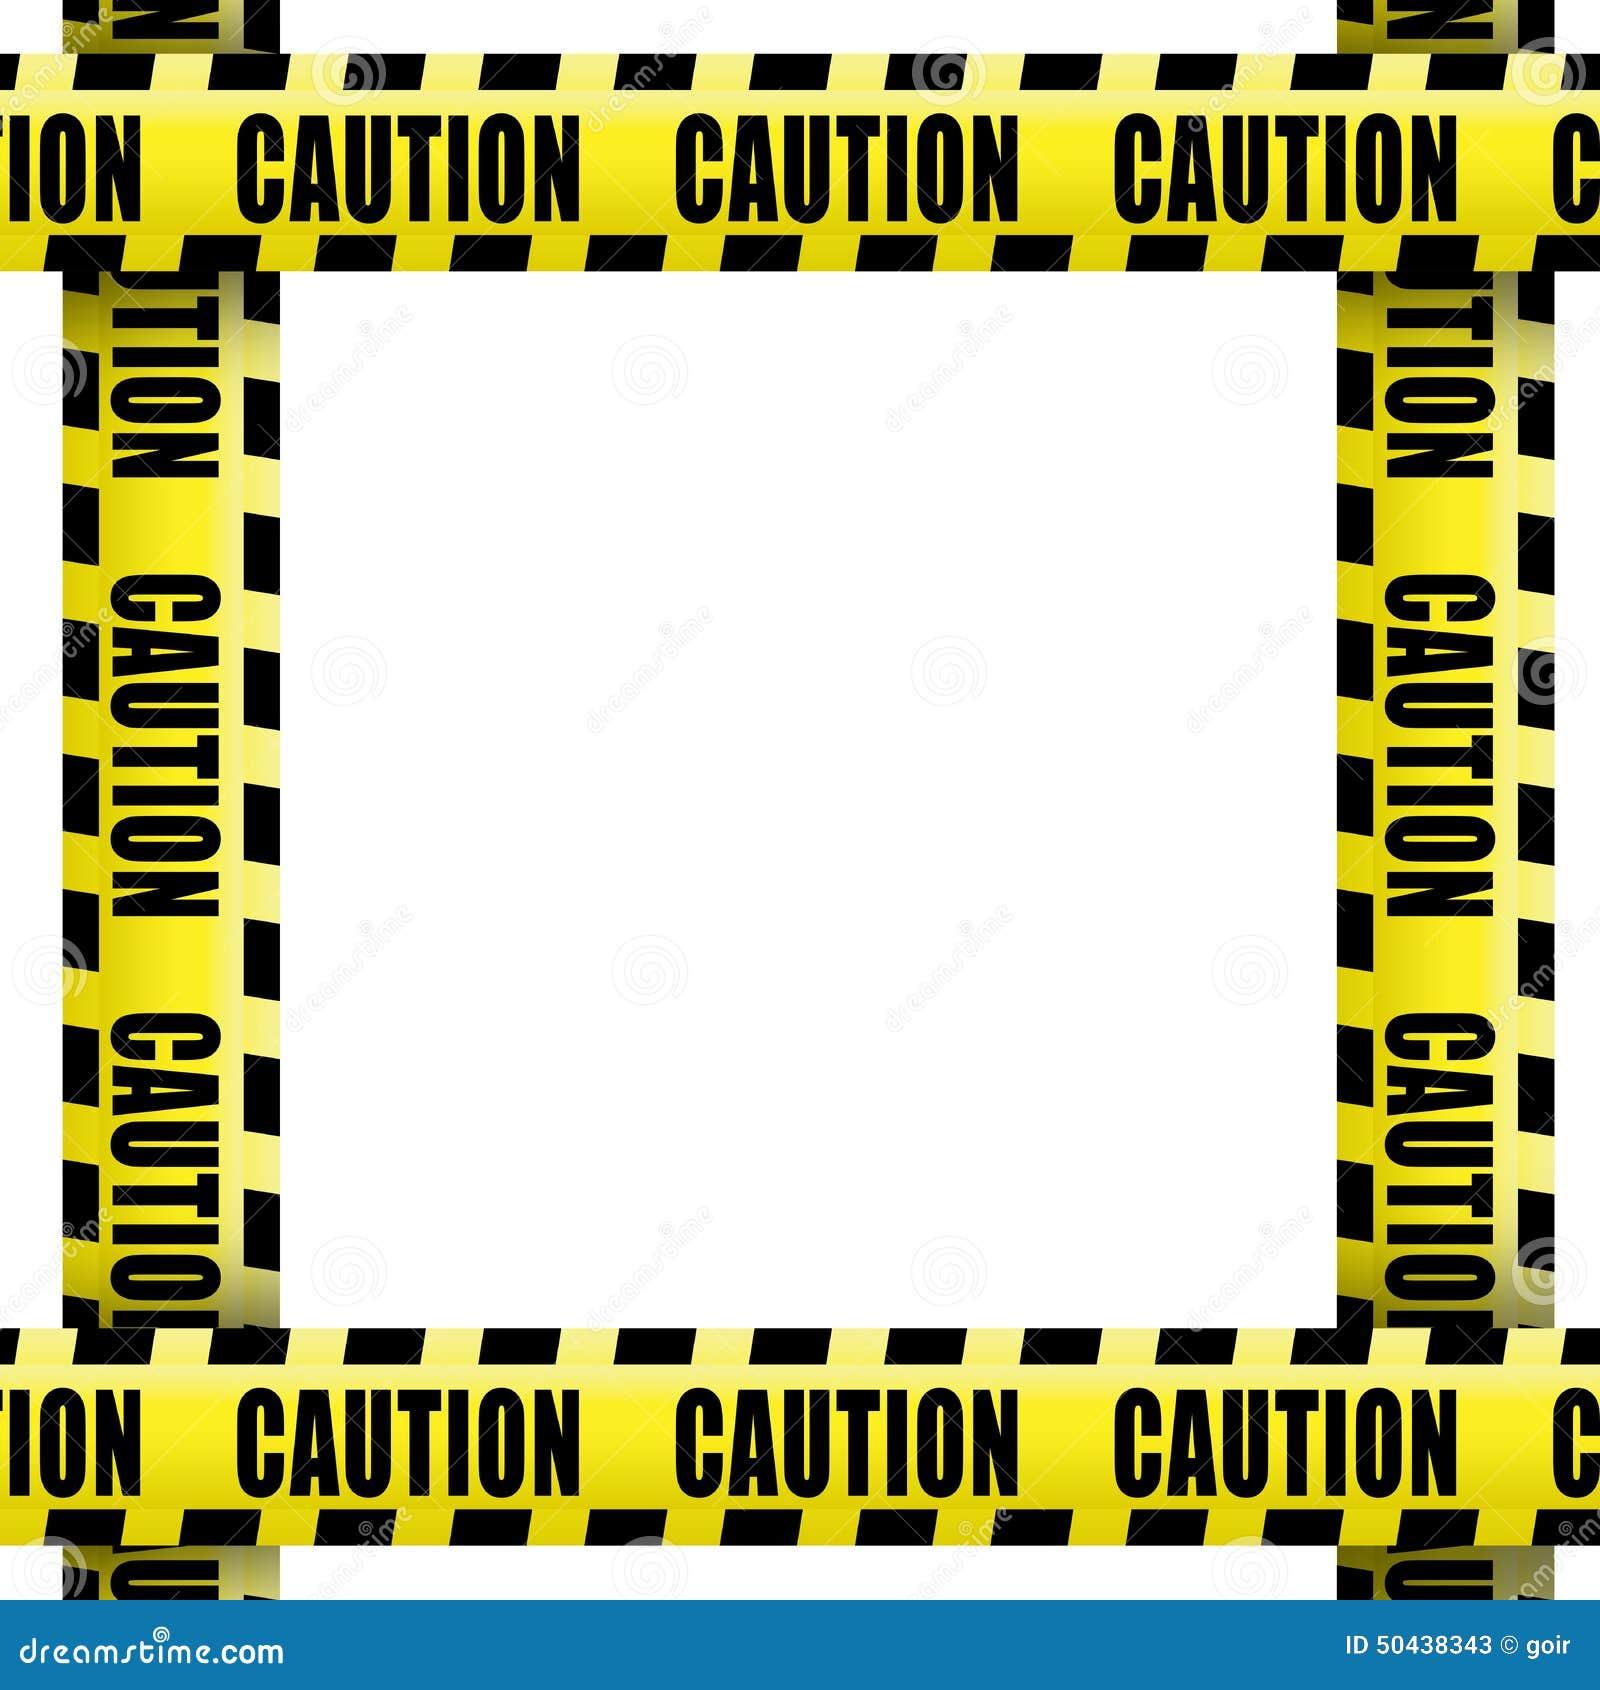 Caution Tape Frame Stock Photo Image 50438343